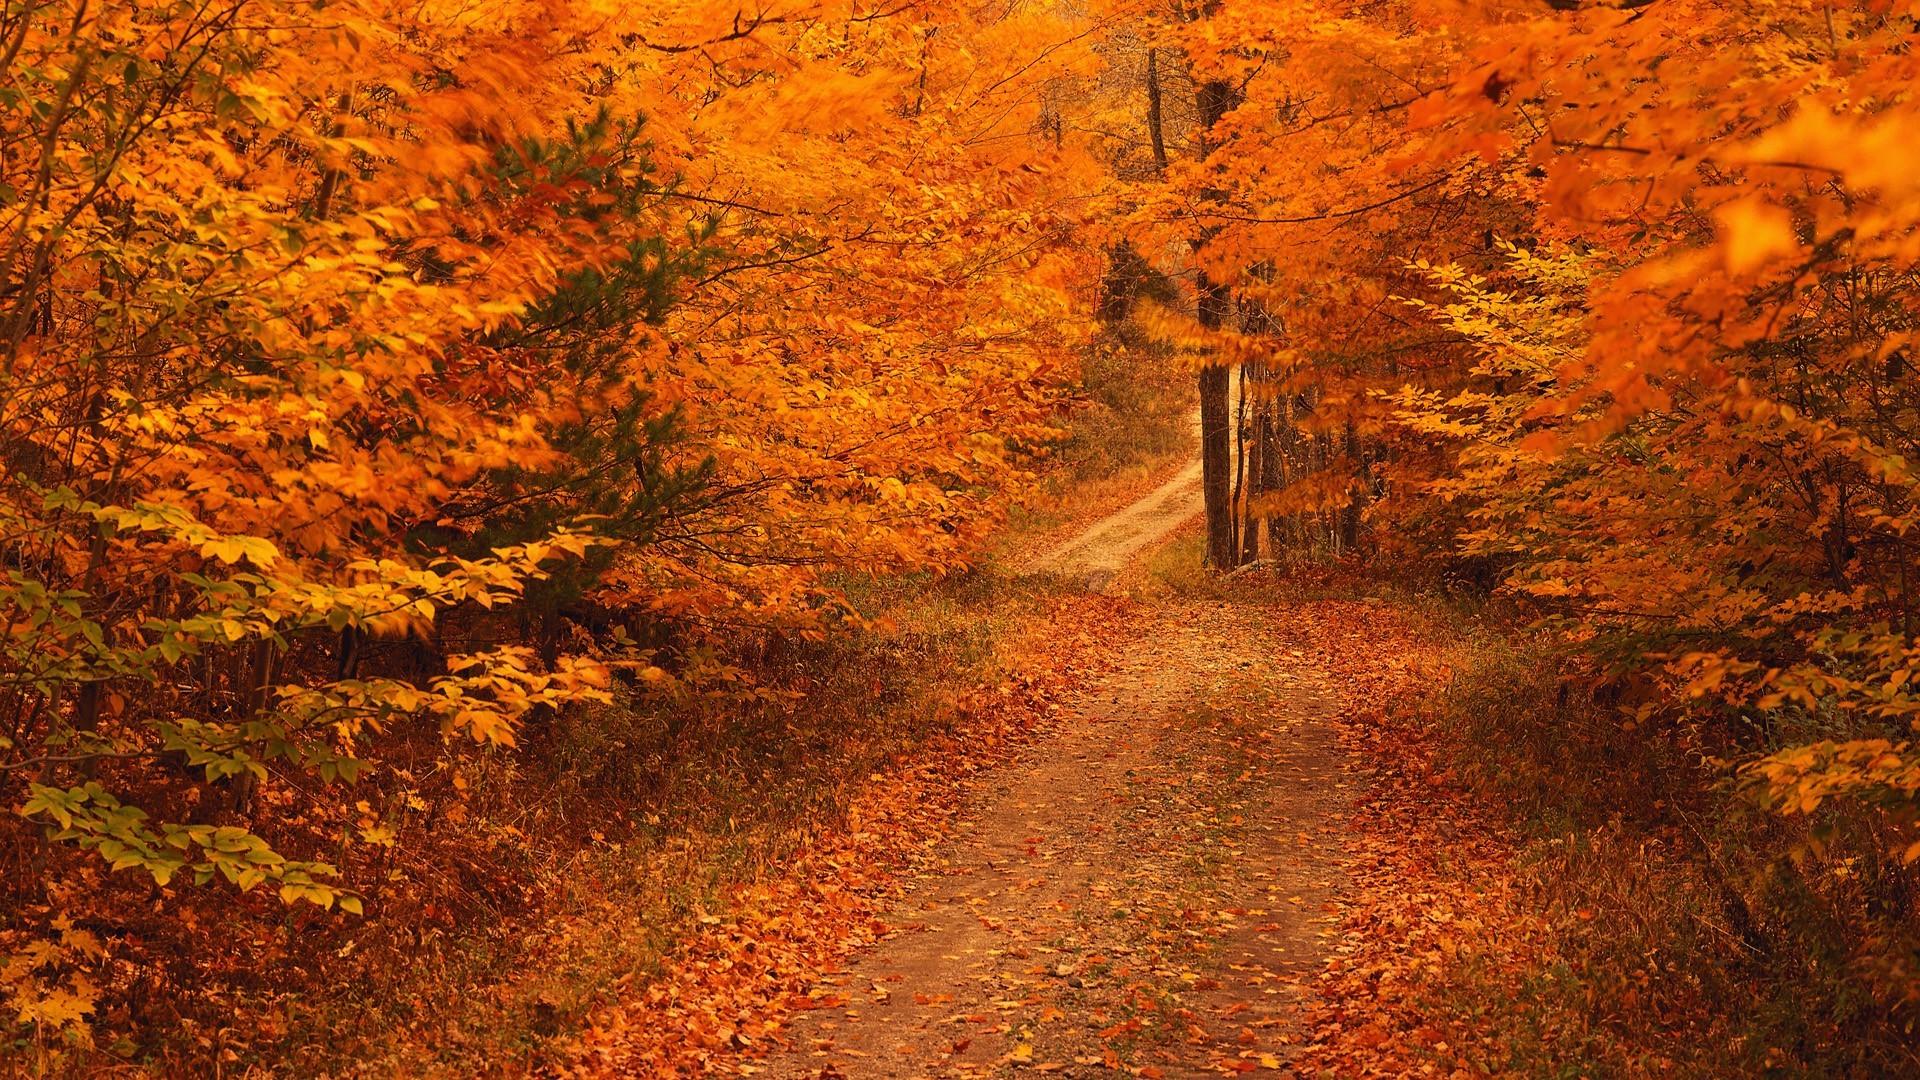 Fall Season Desktop Backgrounds | Desktop Image